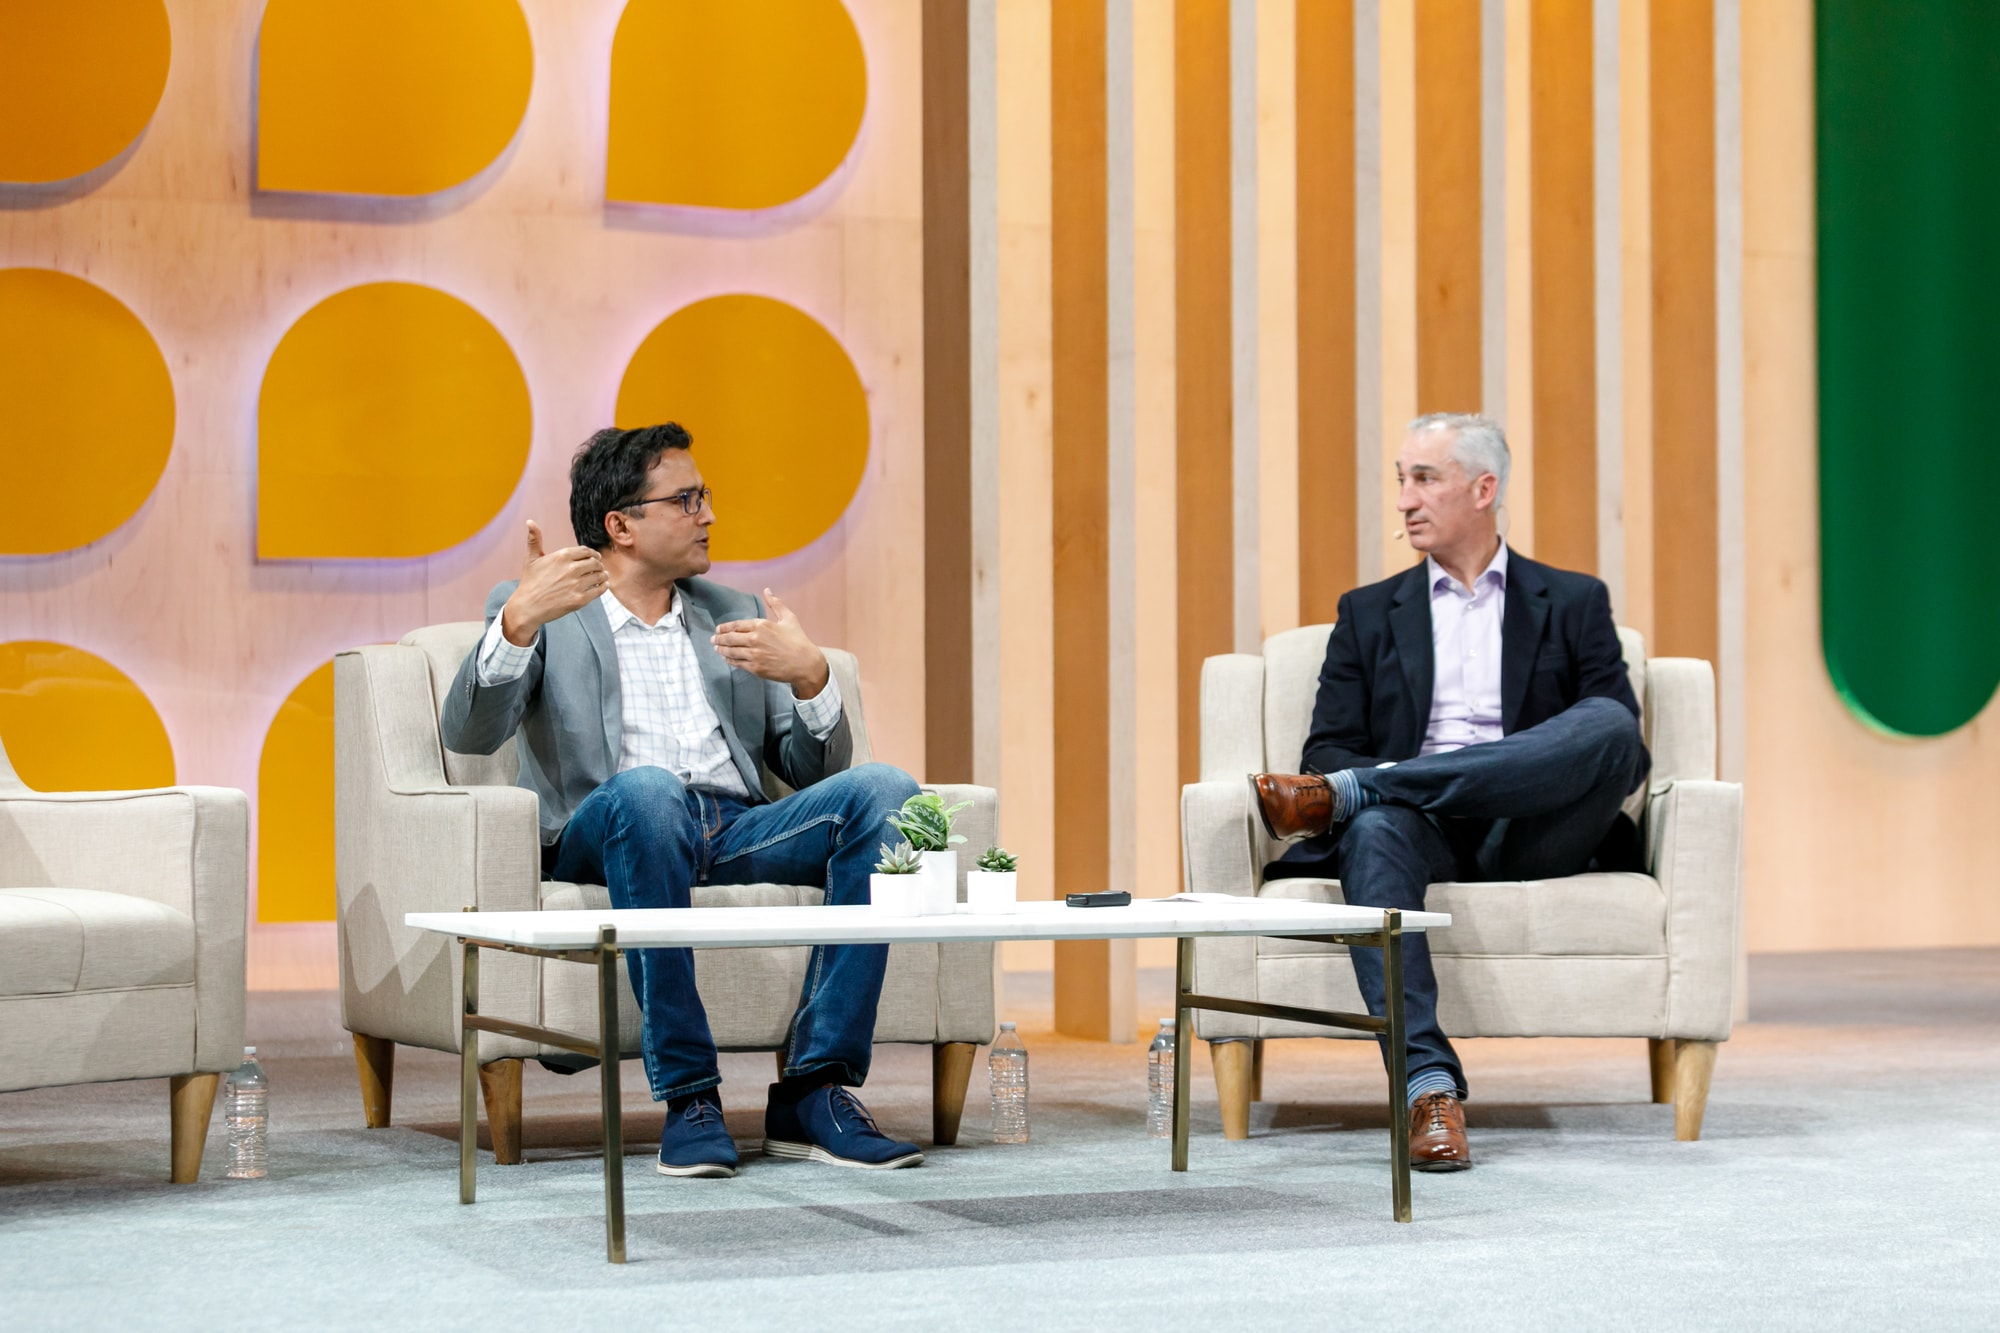 Robert Frati, SVP of Sales and Customer Success at Slack, and Gopi Parampalli, VP of IT at Electronic Arts